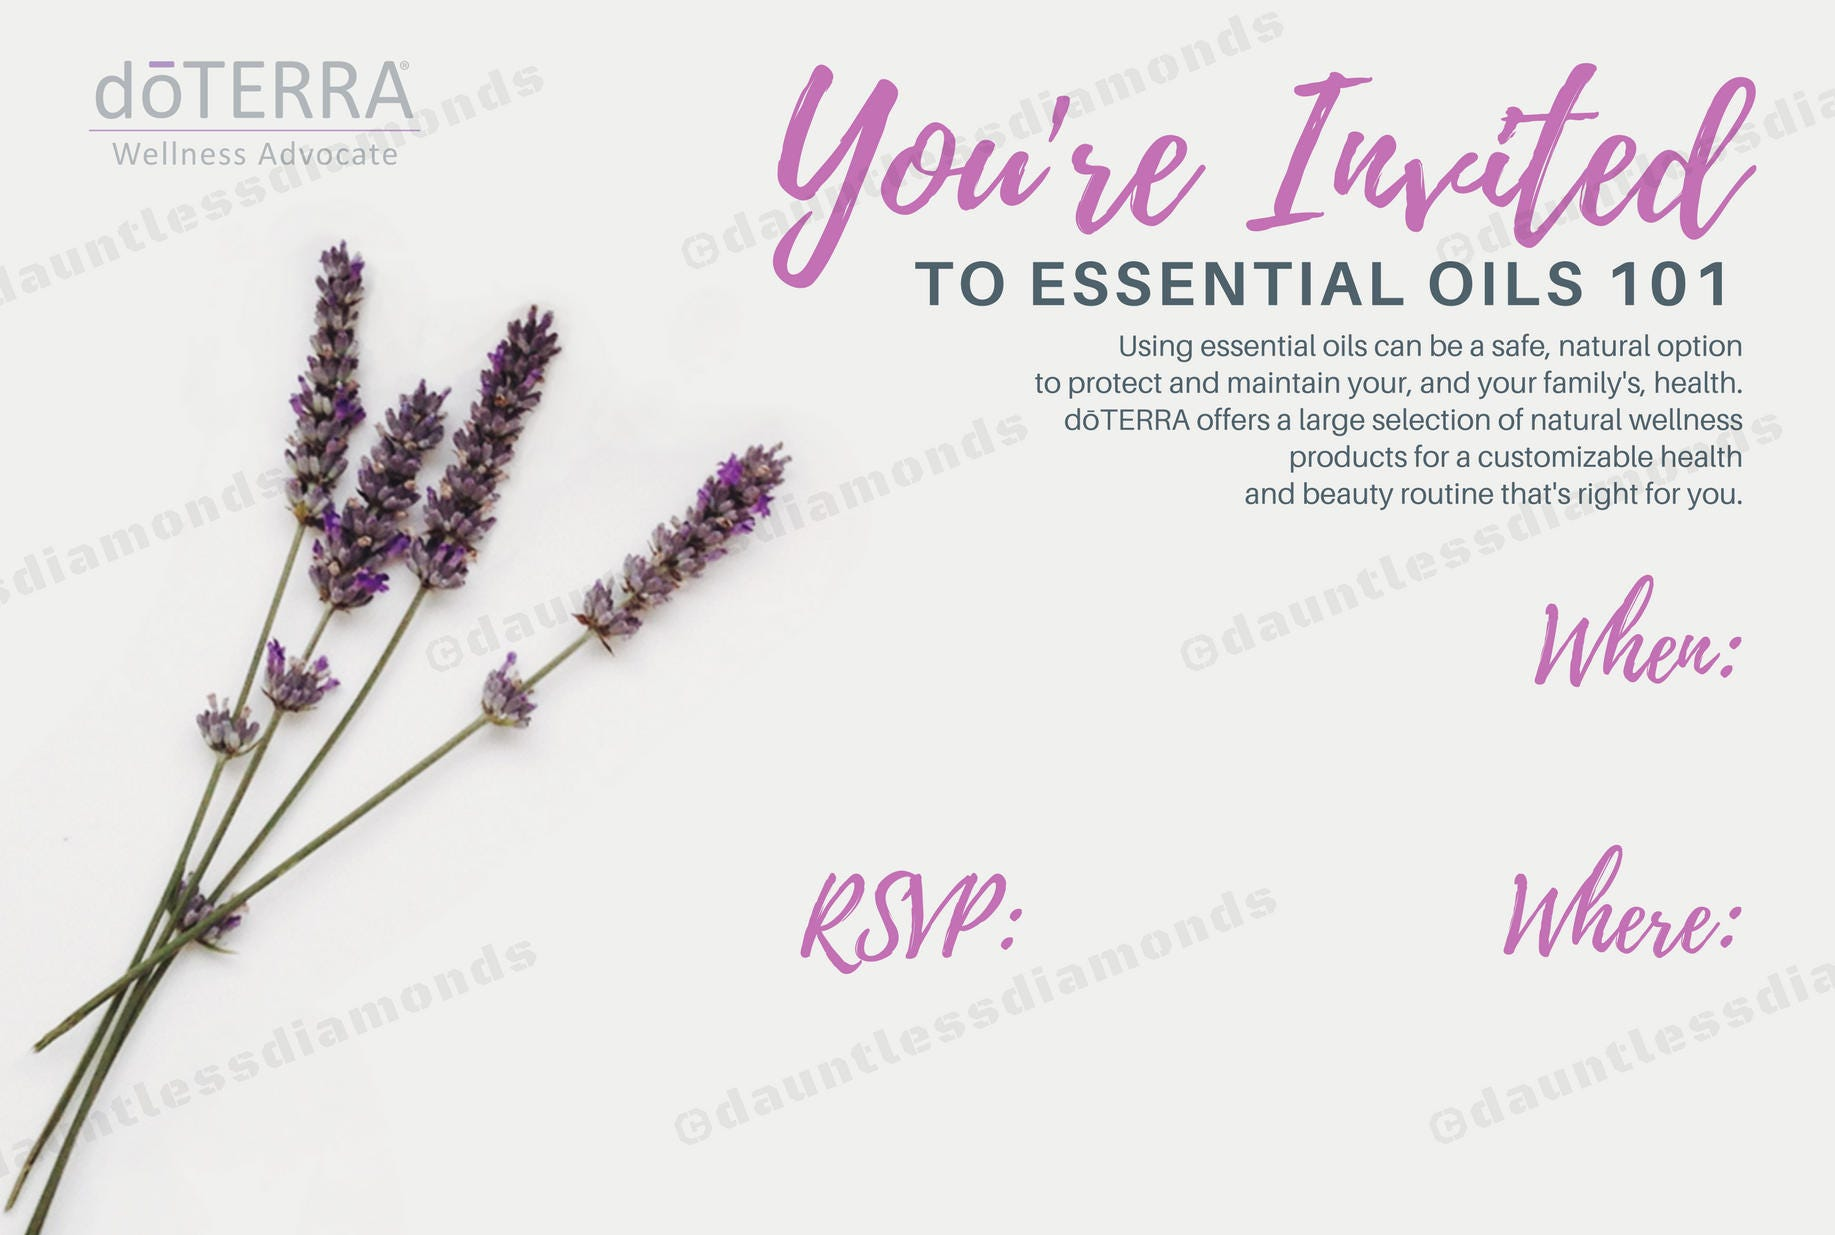 doTERRA Class Invitation Lavender II from DauntlessDiamonds on